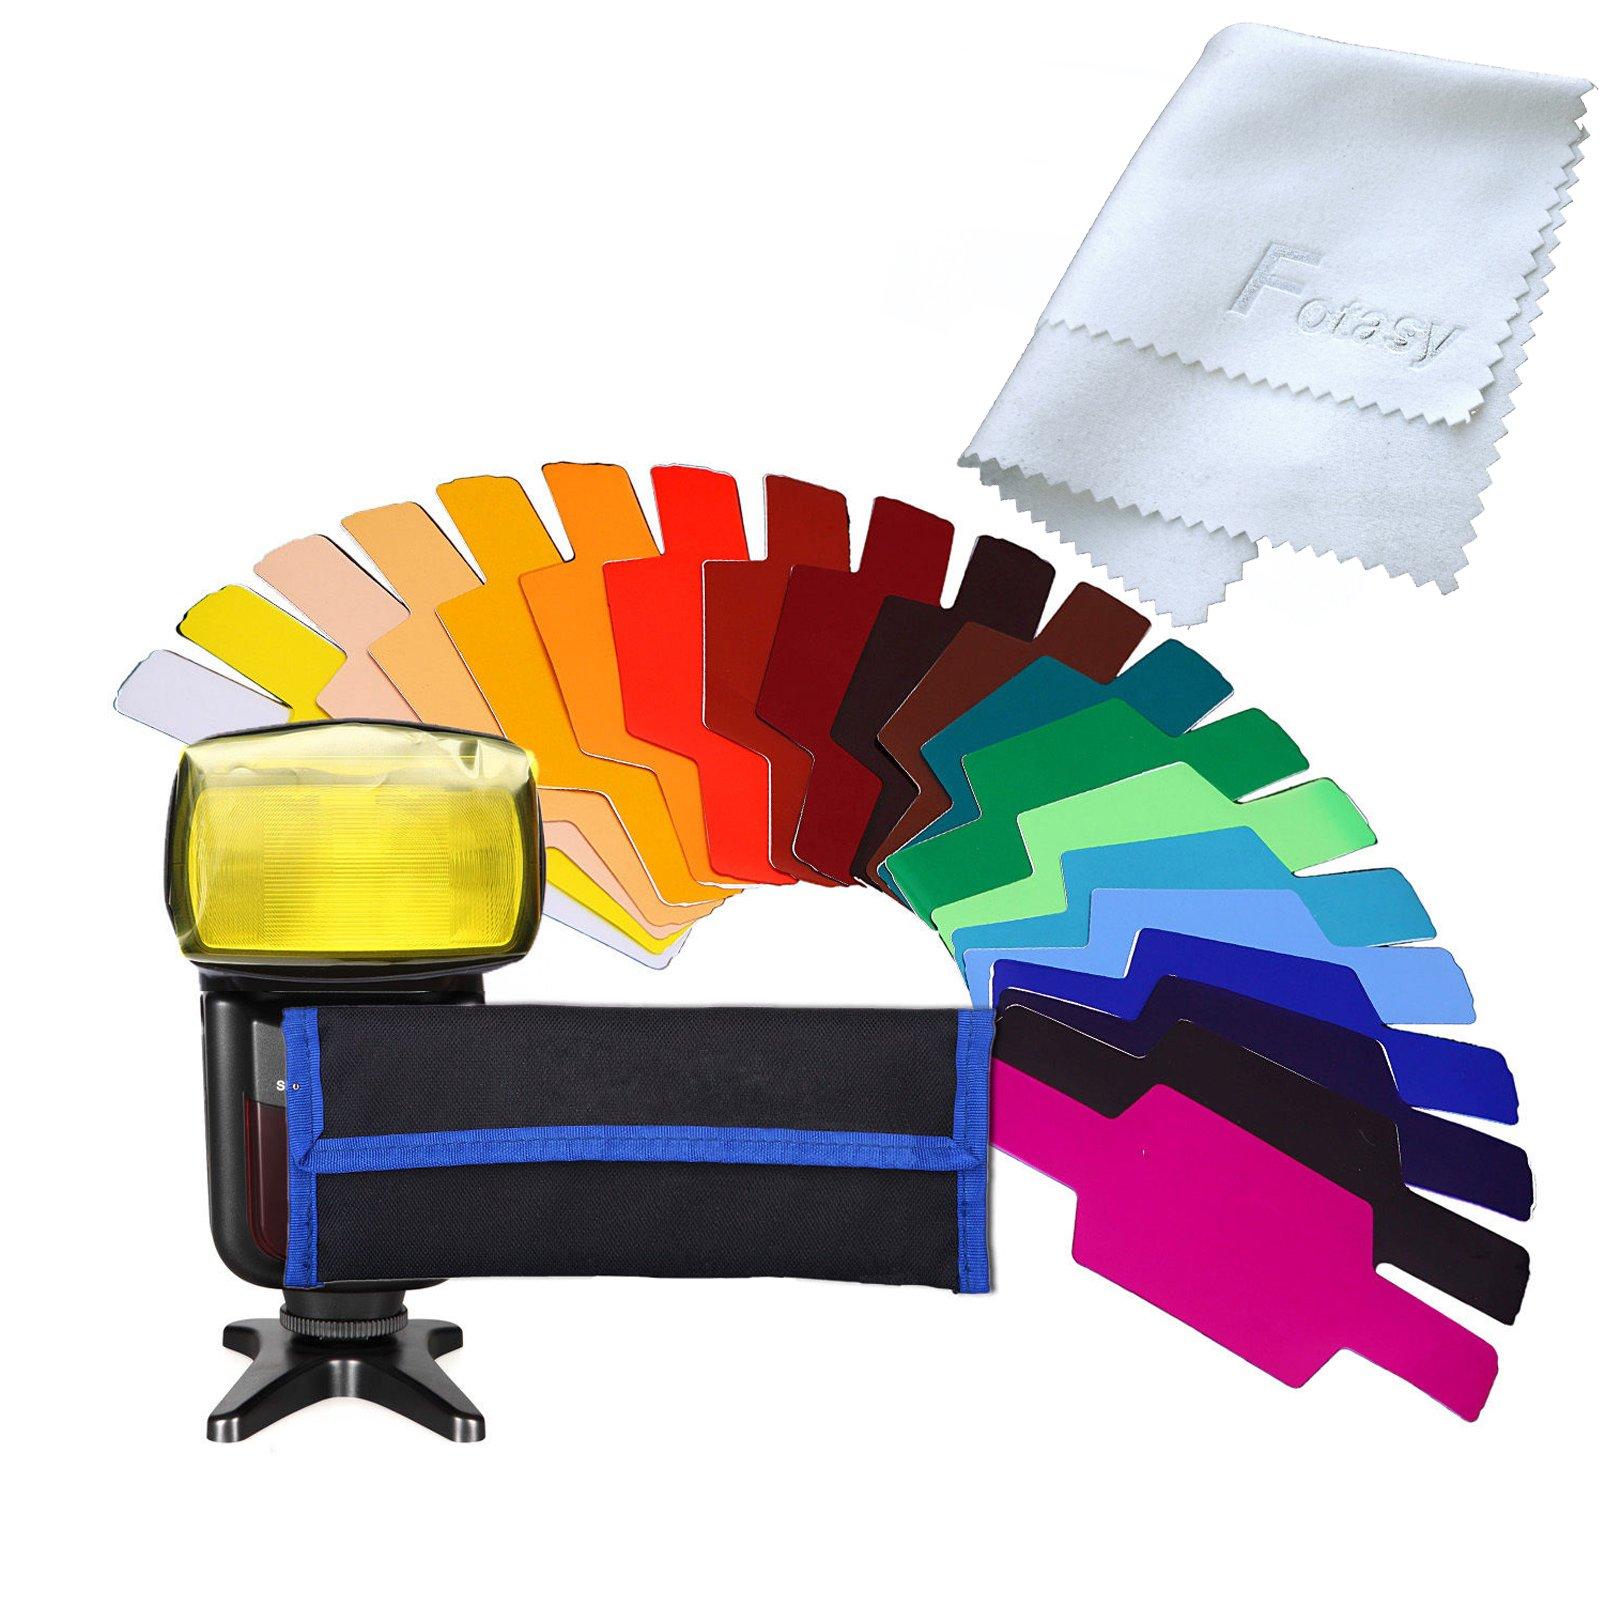 Fotasy Universal Flash Gels Lighting Filter, 20 pcs Combination Kit for Photo Studio Strobe Flash Light